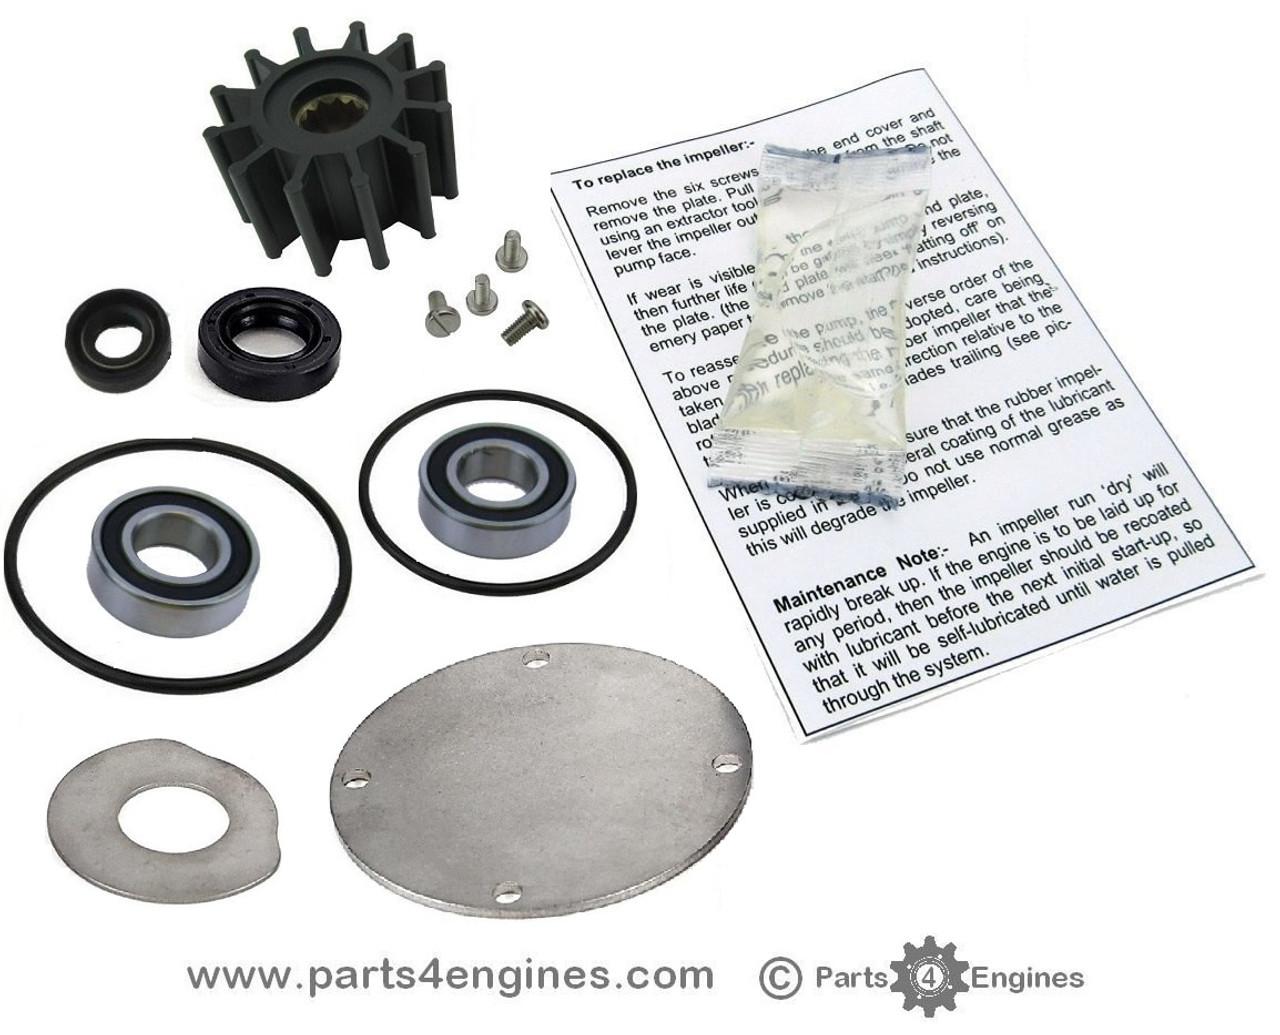 Volvo Penta D2-75 Raw water pump rebuild kit - parts4engines.com